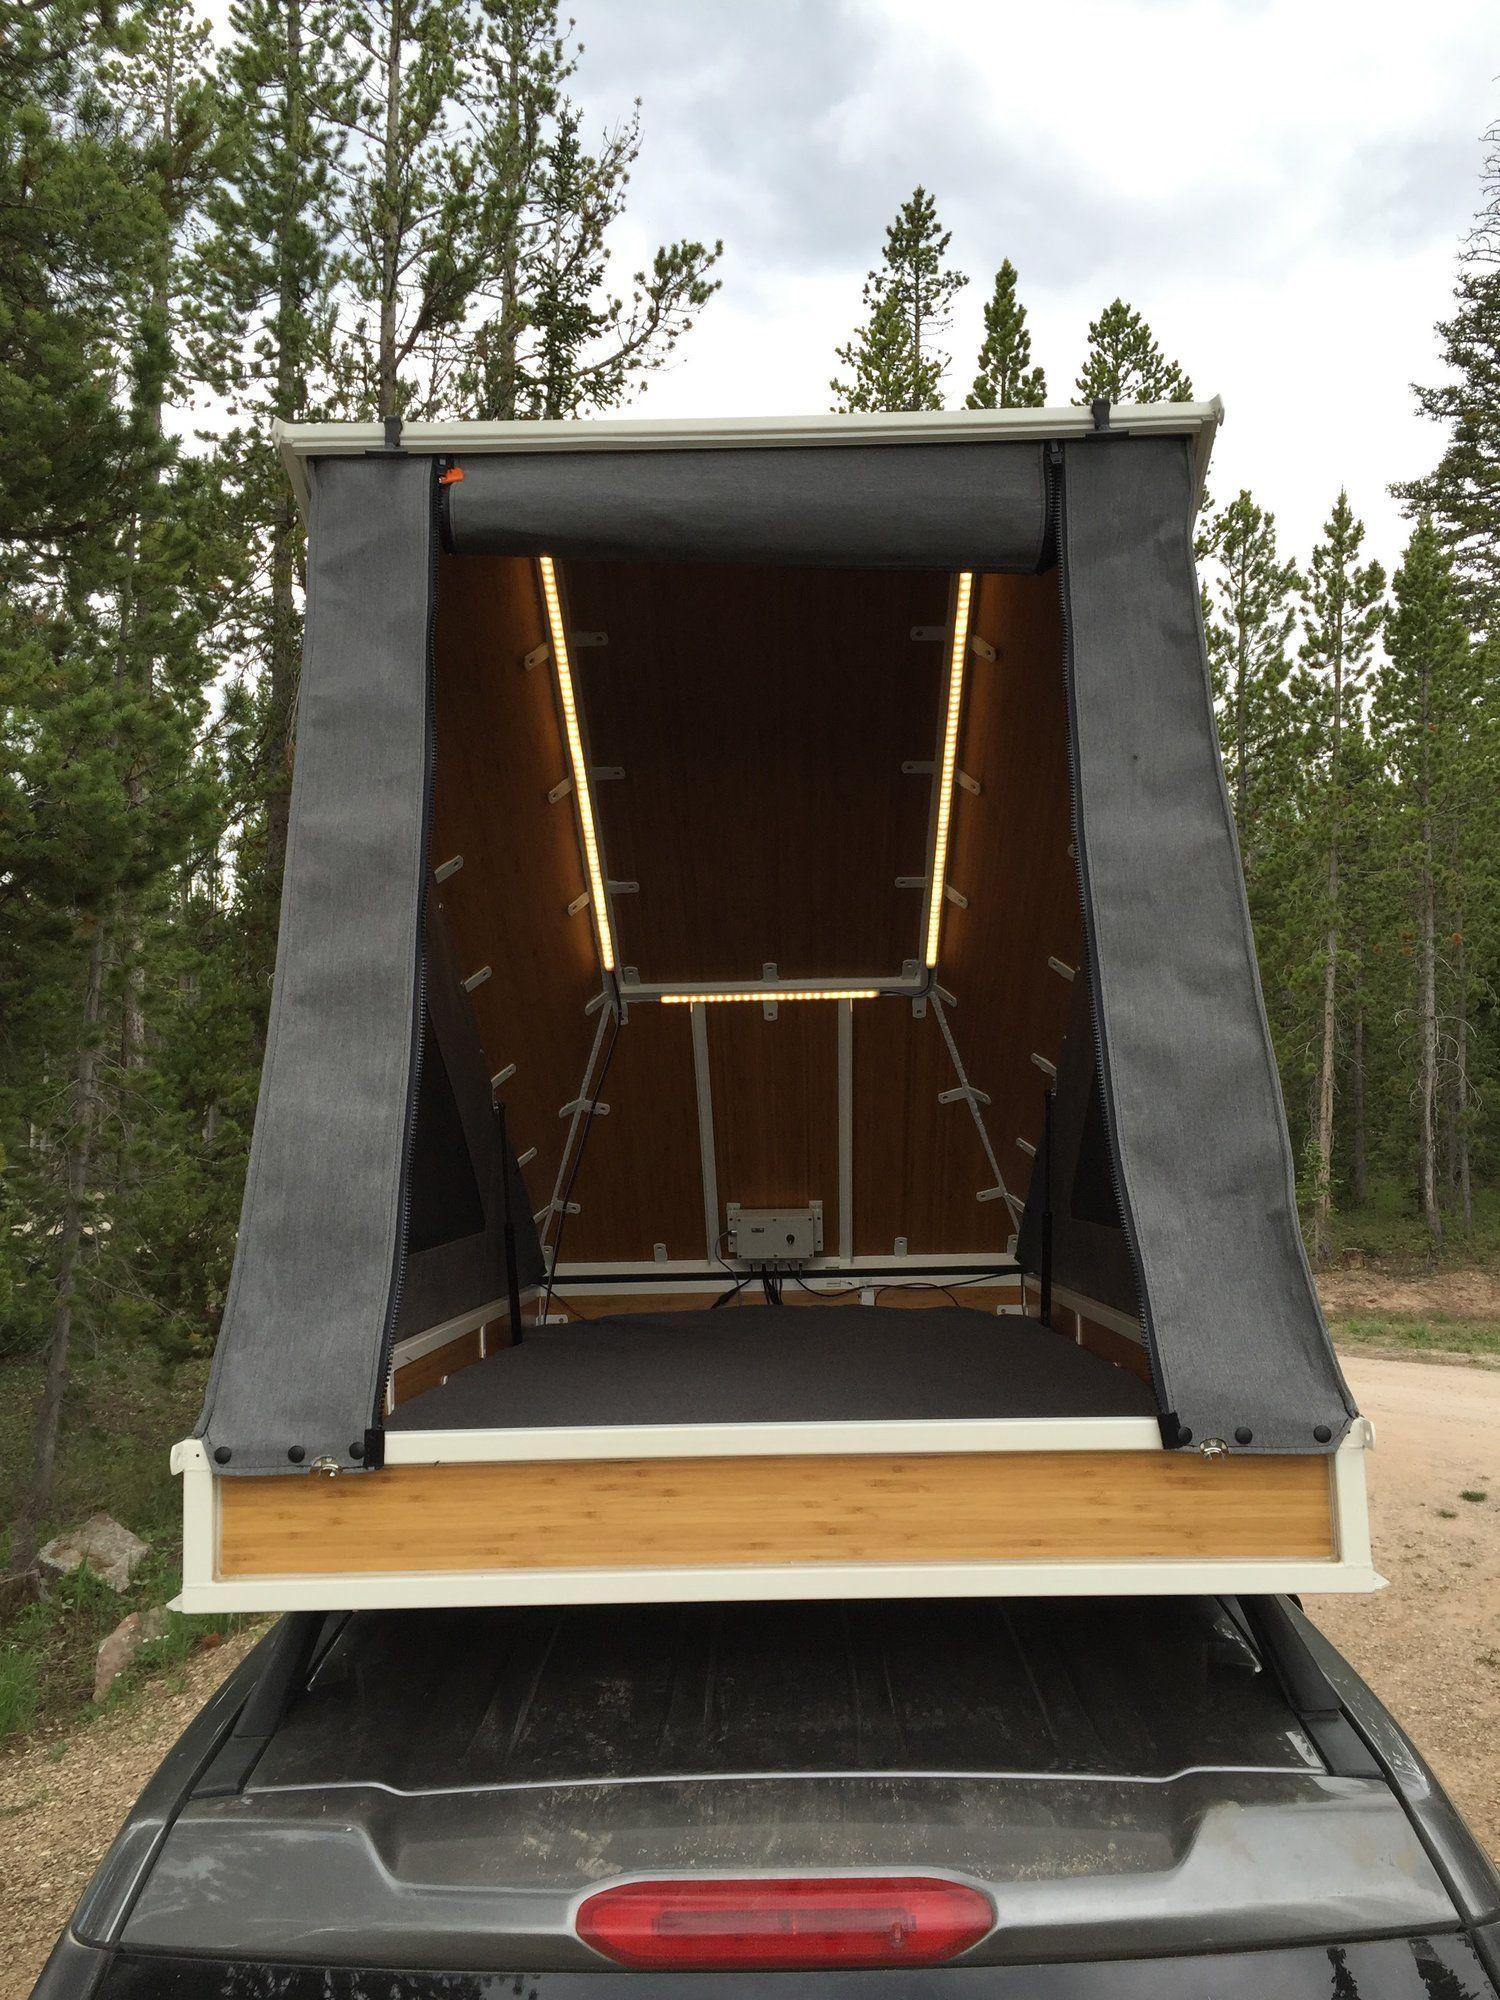 Auto Tent Dewitte Co Roof Top Tent Diy Roof Top Tent Roof Tent